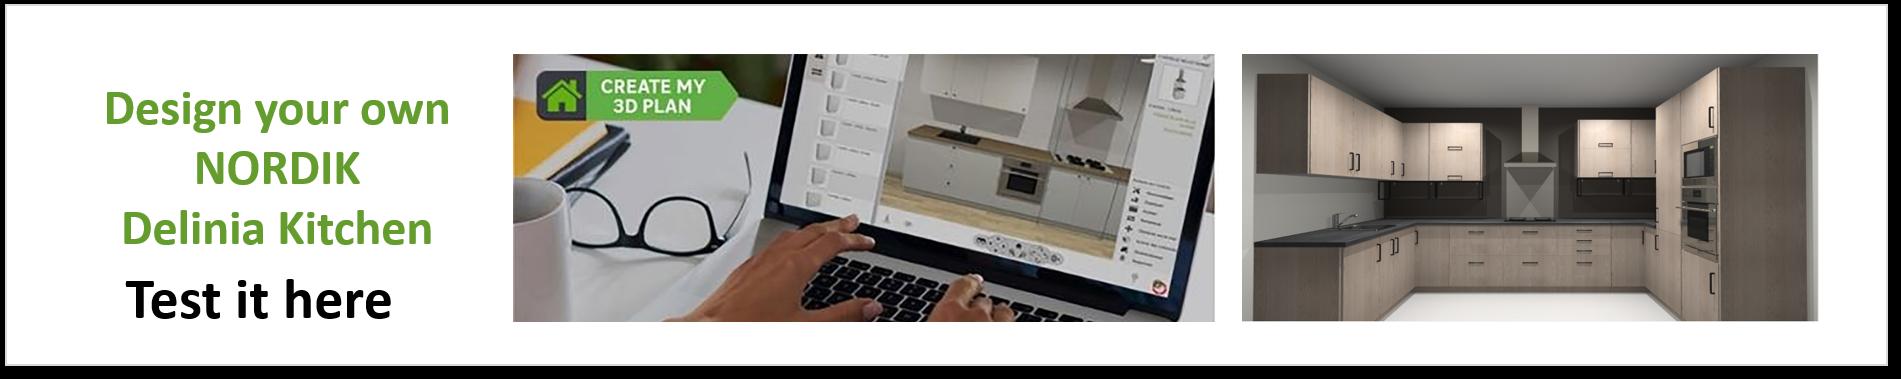 Create or Design your own Delinia Nordik Designer Kitchen